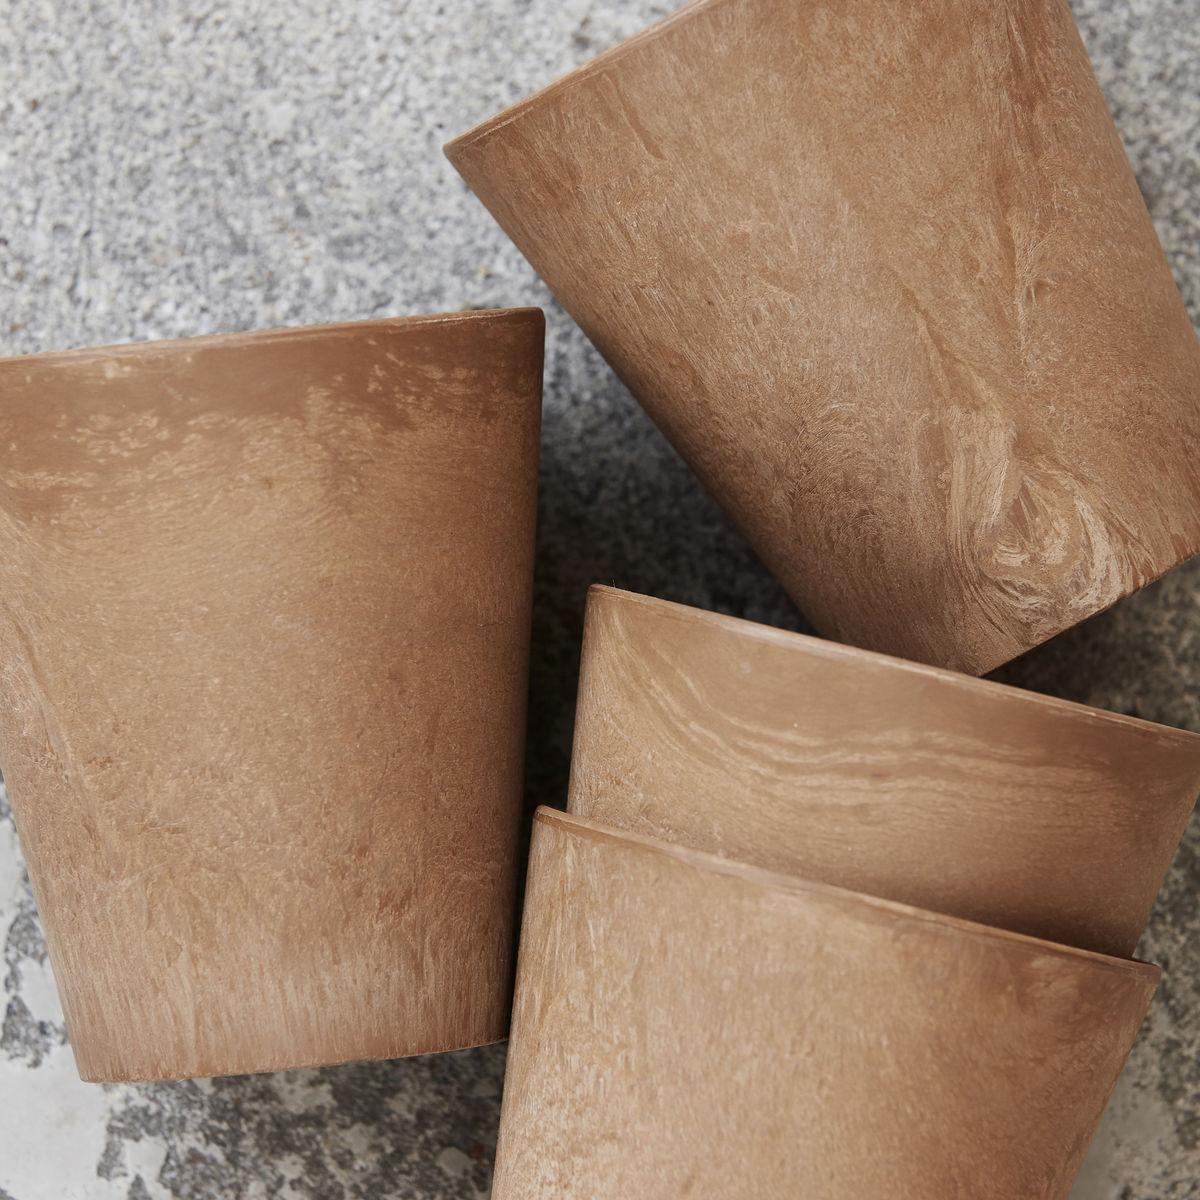 plastic brown mug